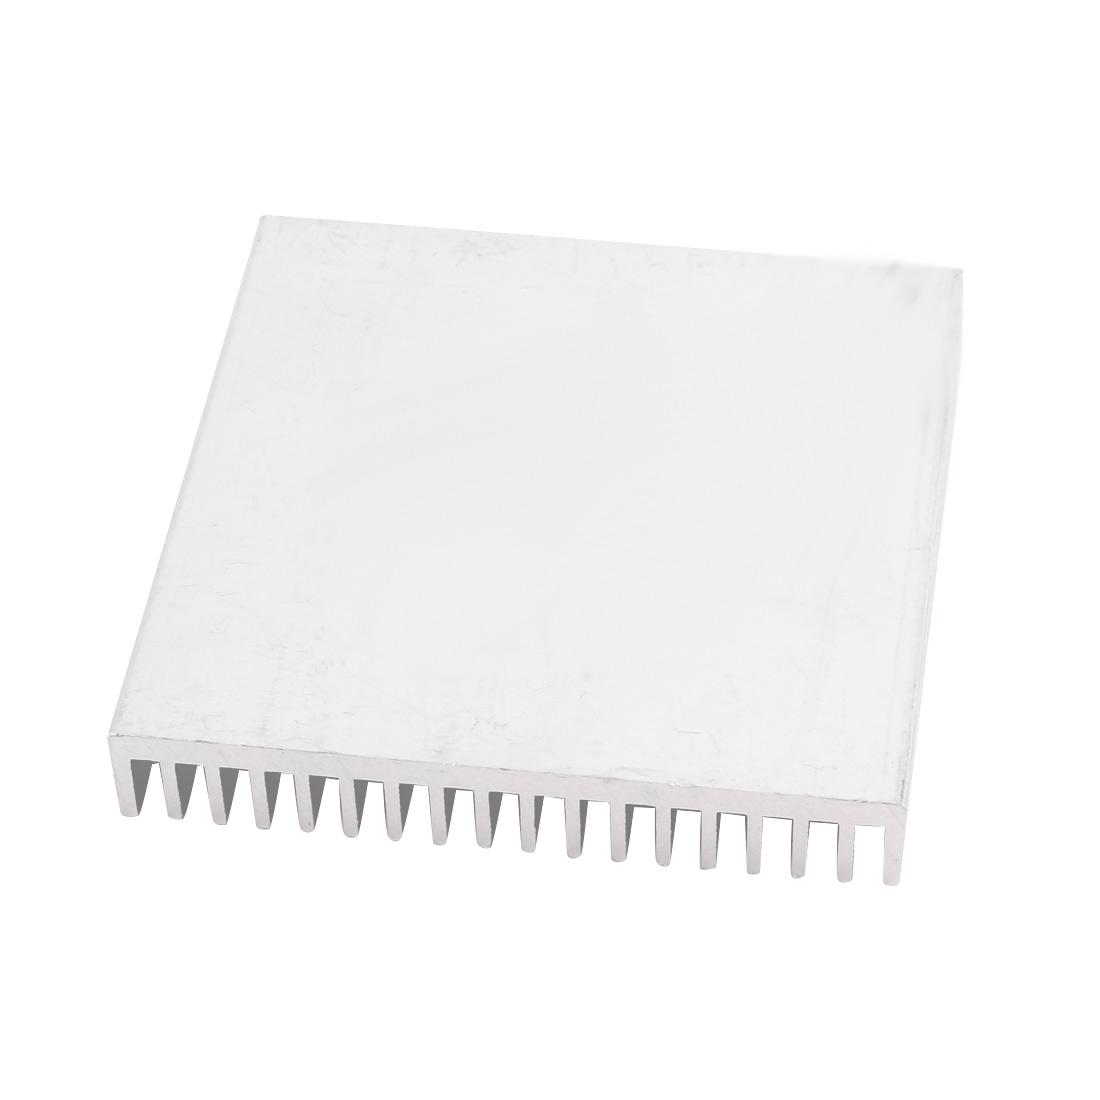 70mmx70mmx11mm Aluminum Heatsink Heat Diffuse Cooling Fin